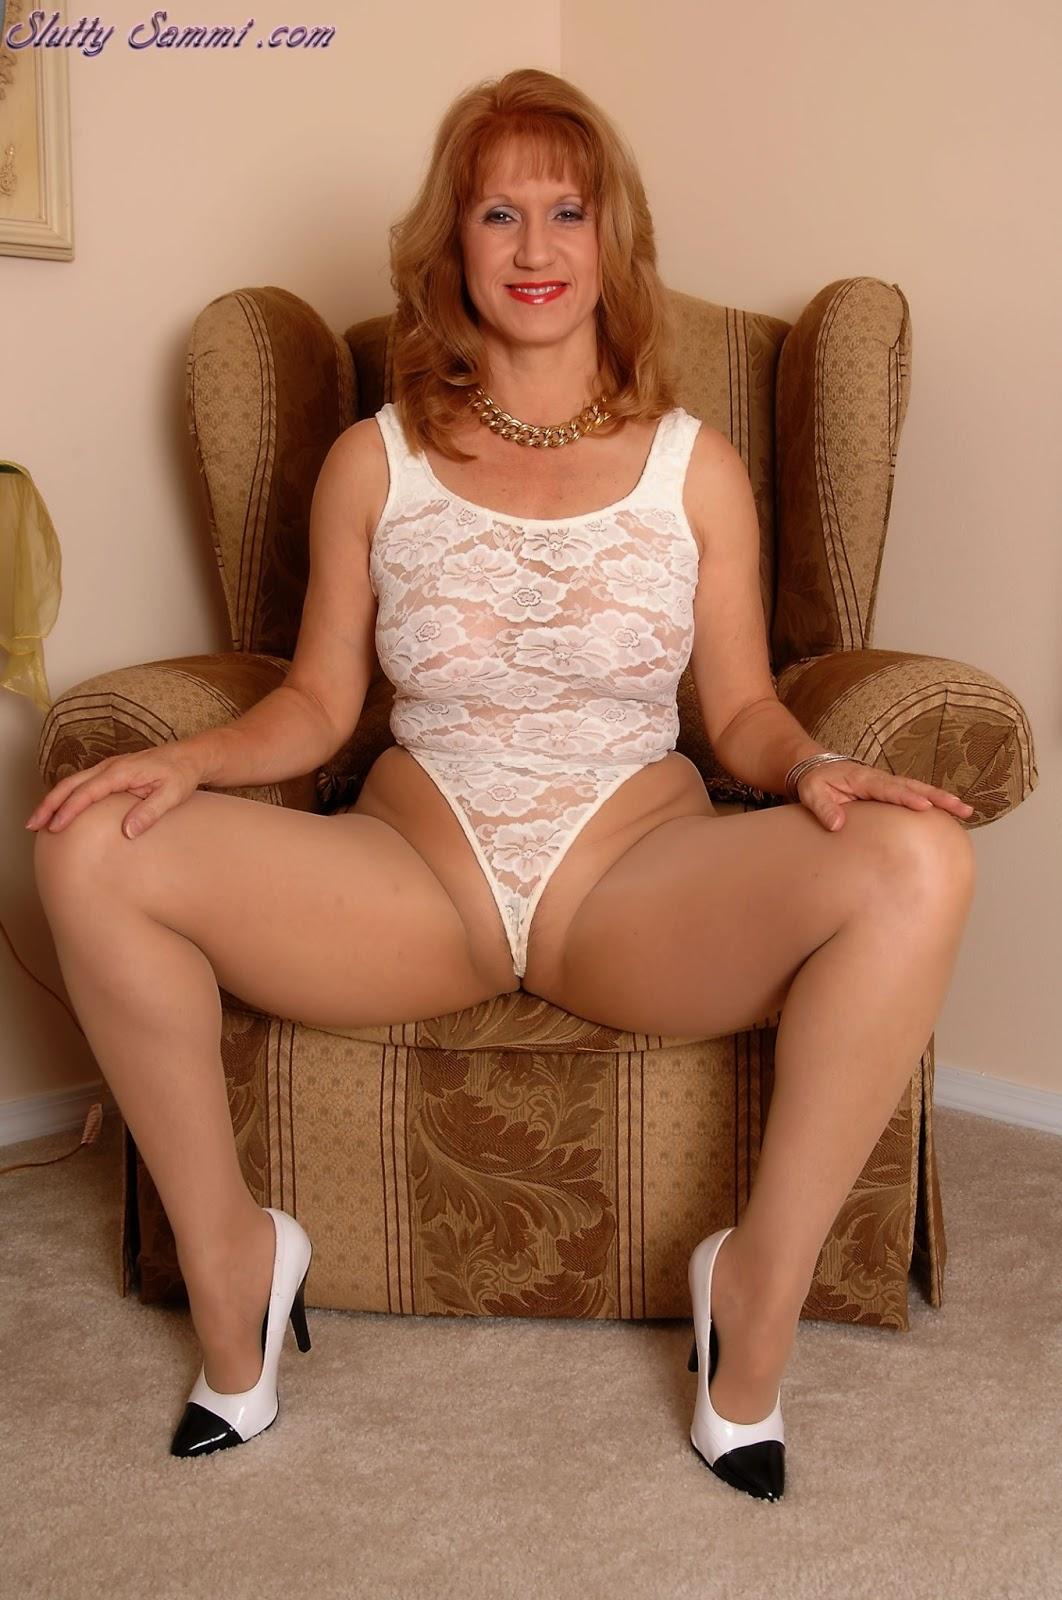 pantyhose princess sammi Slutty